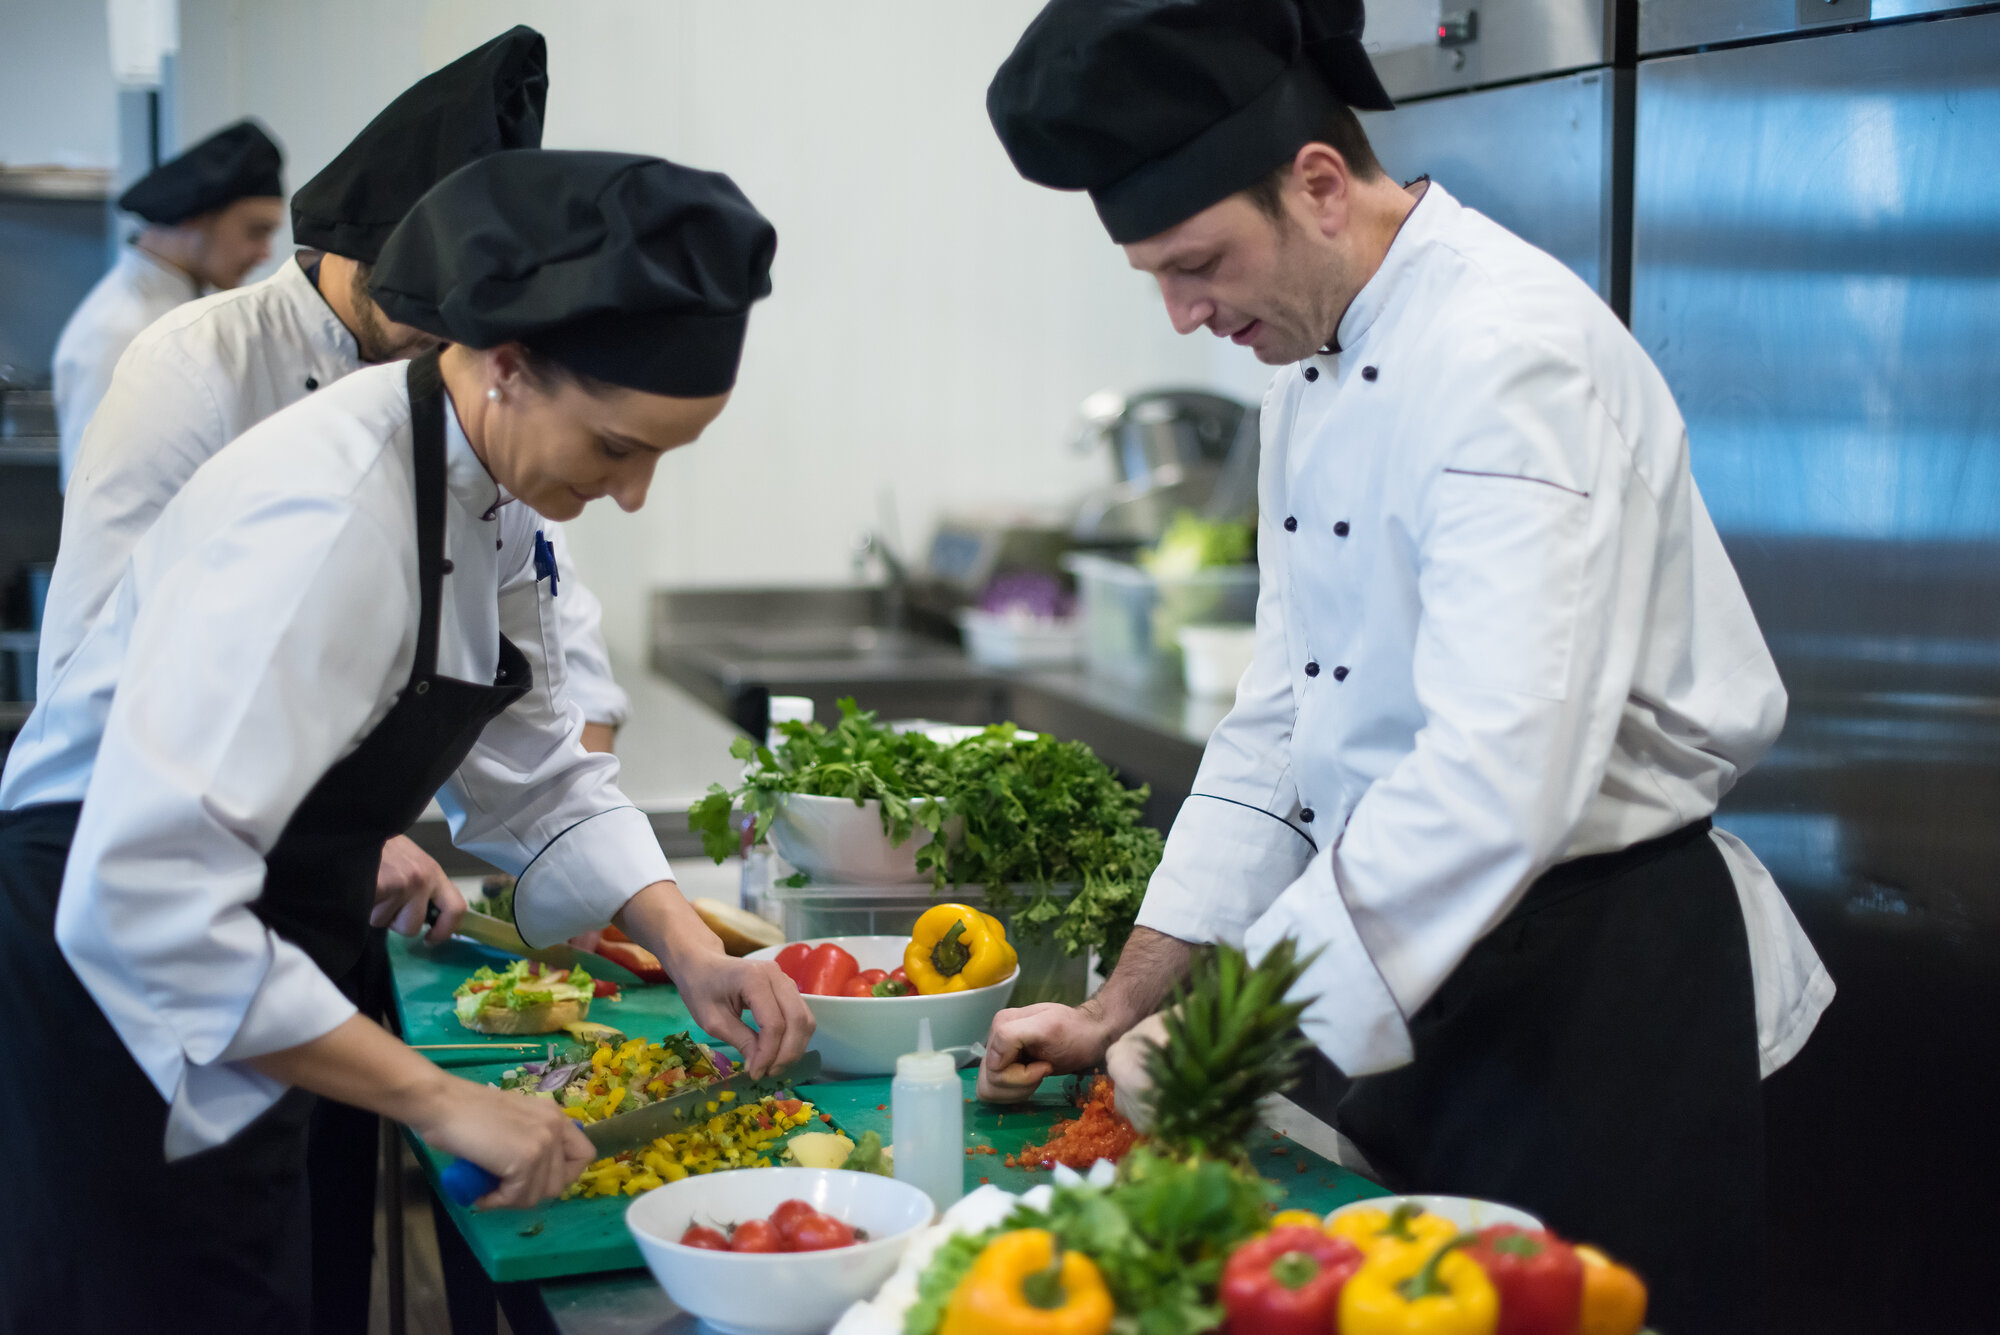 team cooks and chefs preparing meals PHEXYWN - Startseite